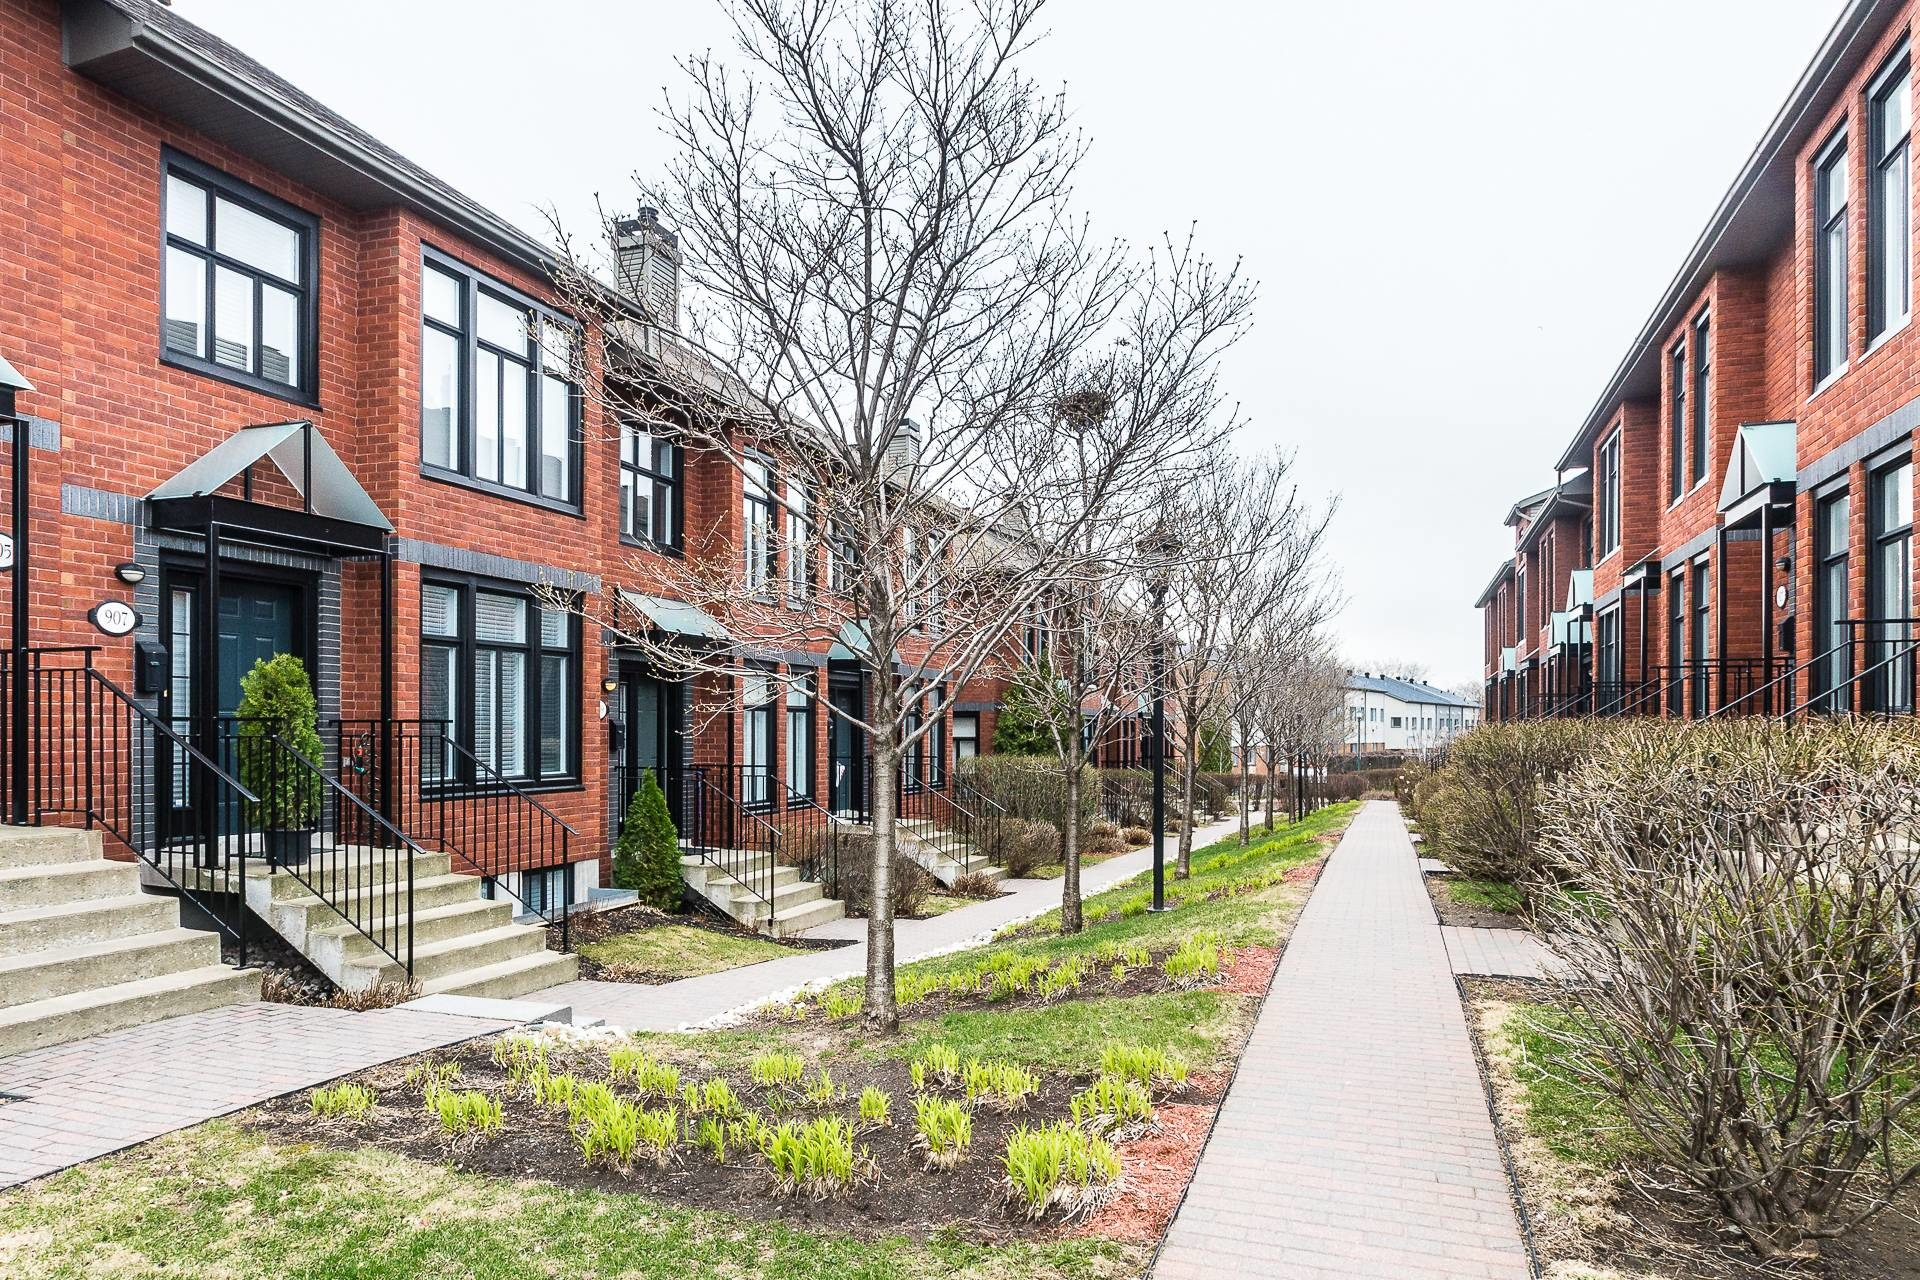 image 28 - MX - Casa sola - MX En venta Montréal Lachine  - 8 habitaciones